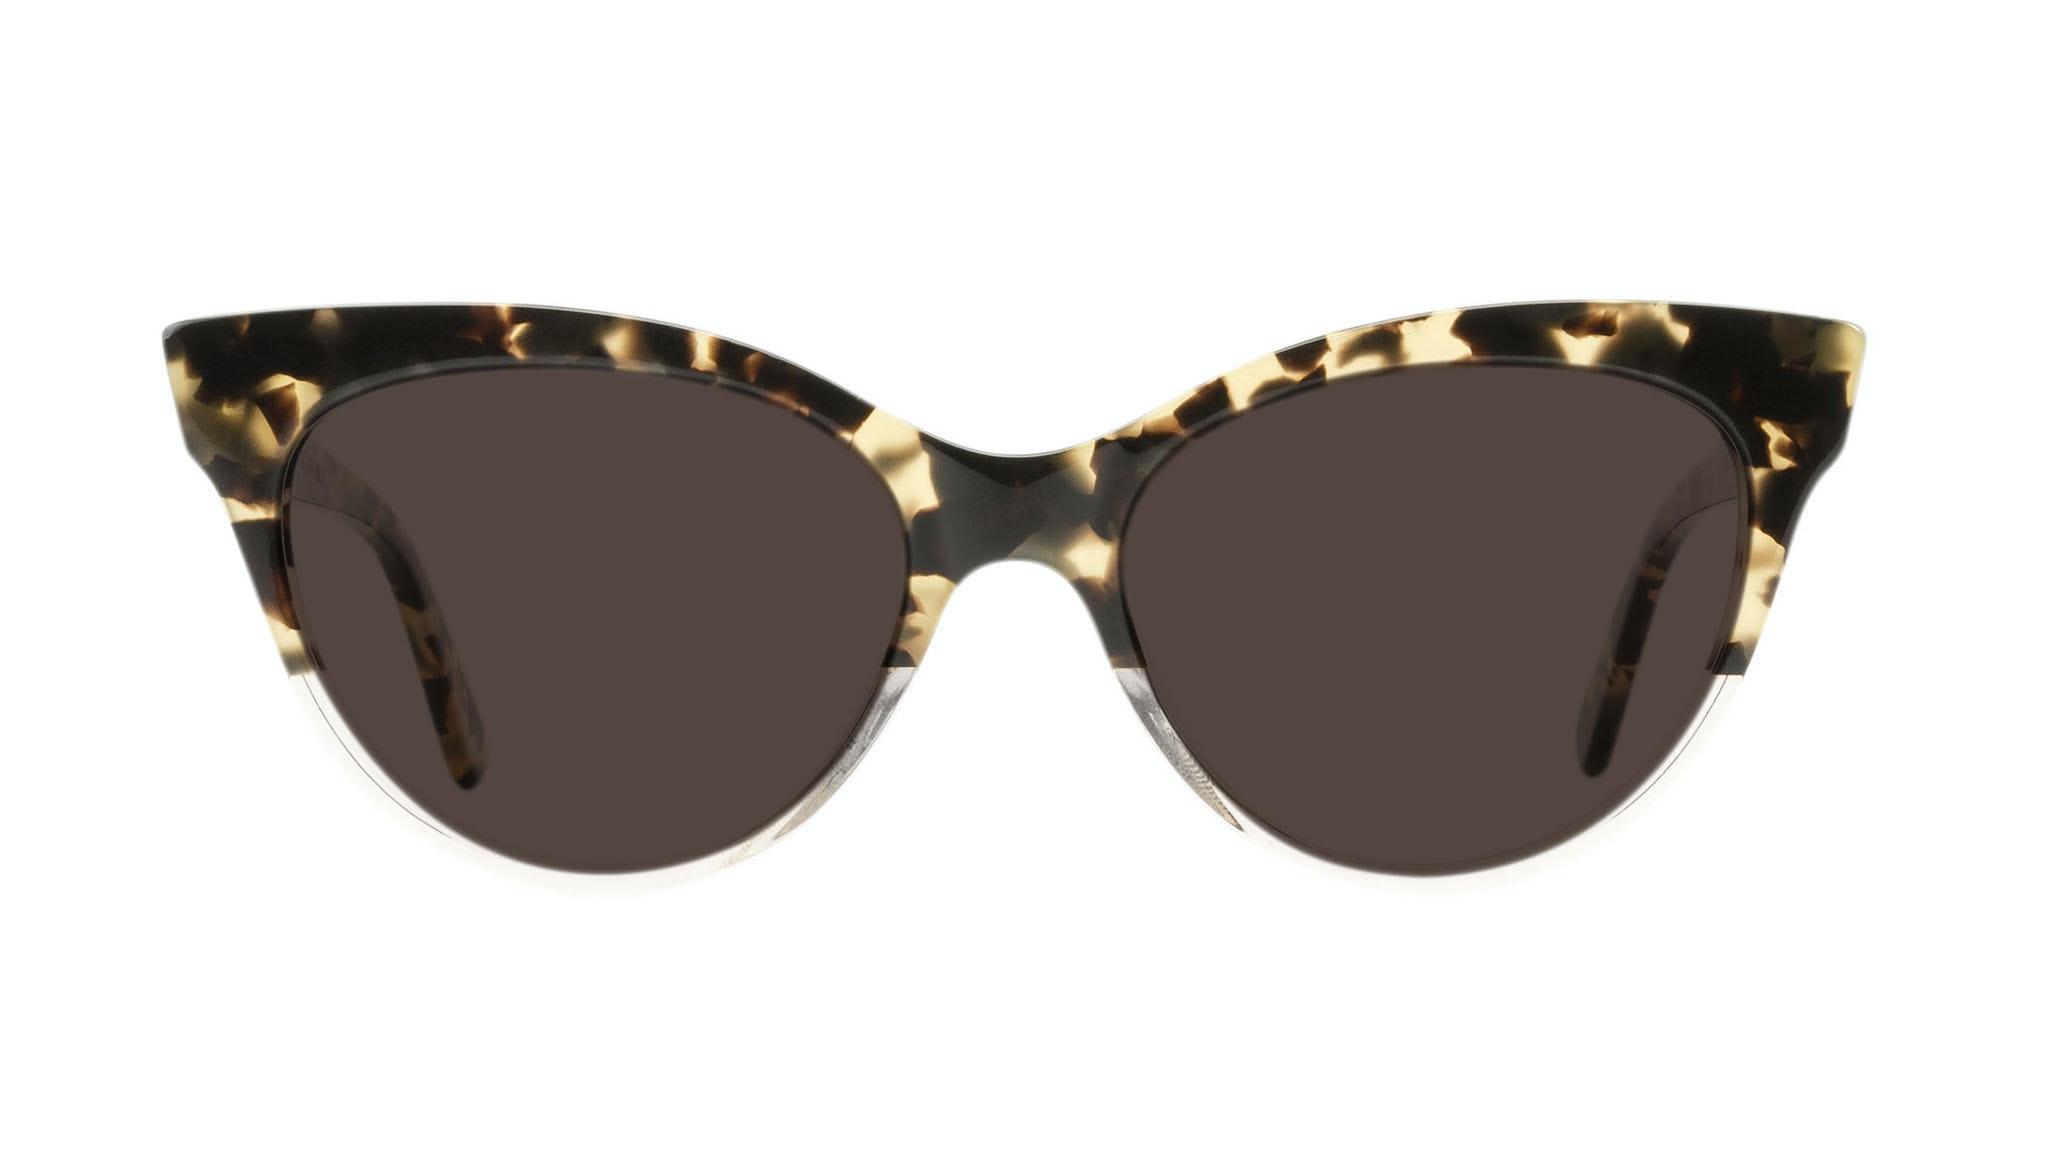 Affordable Fashion Glasses Cat Eye Daring Cateye Sunglasses Women SkunkBoy Champagne Tort